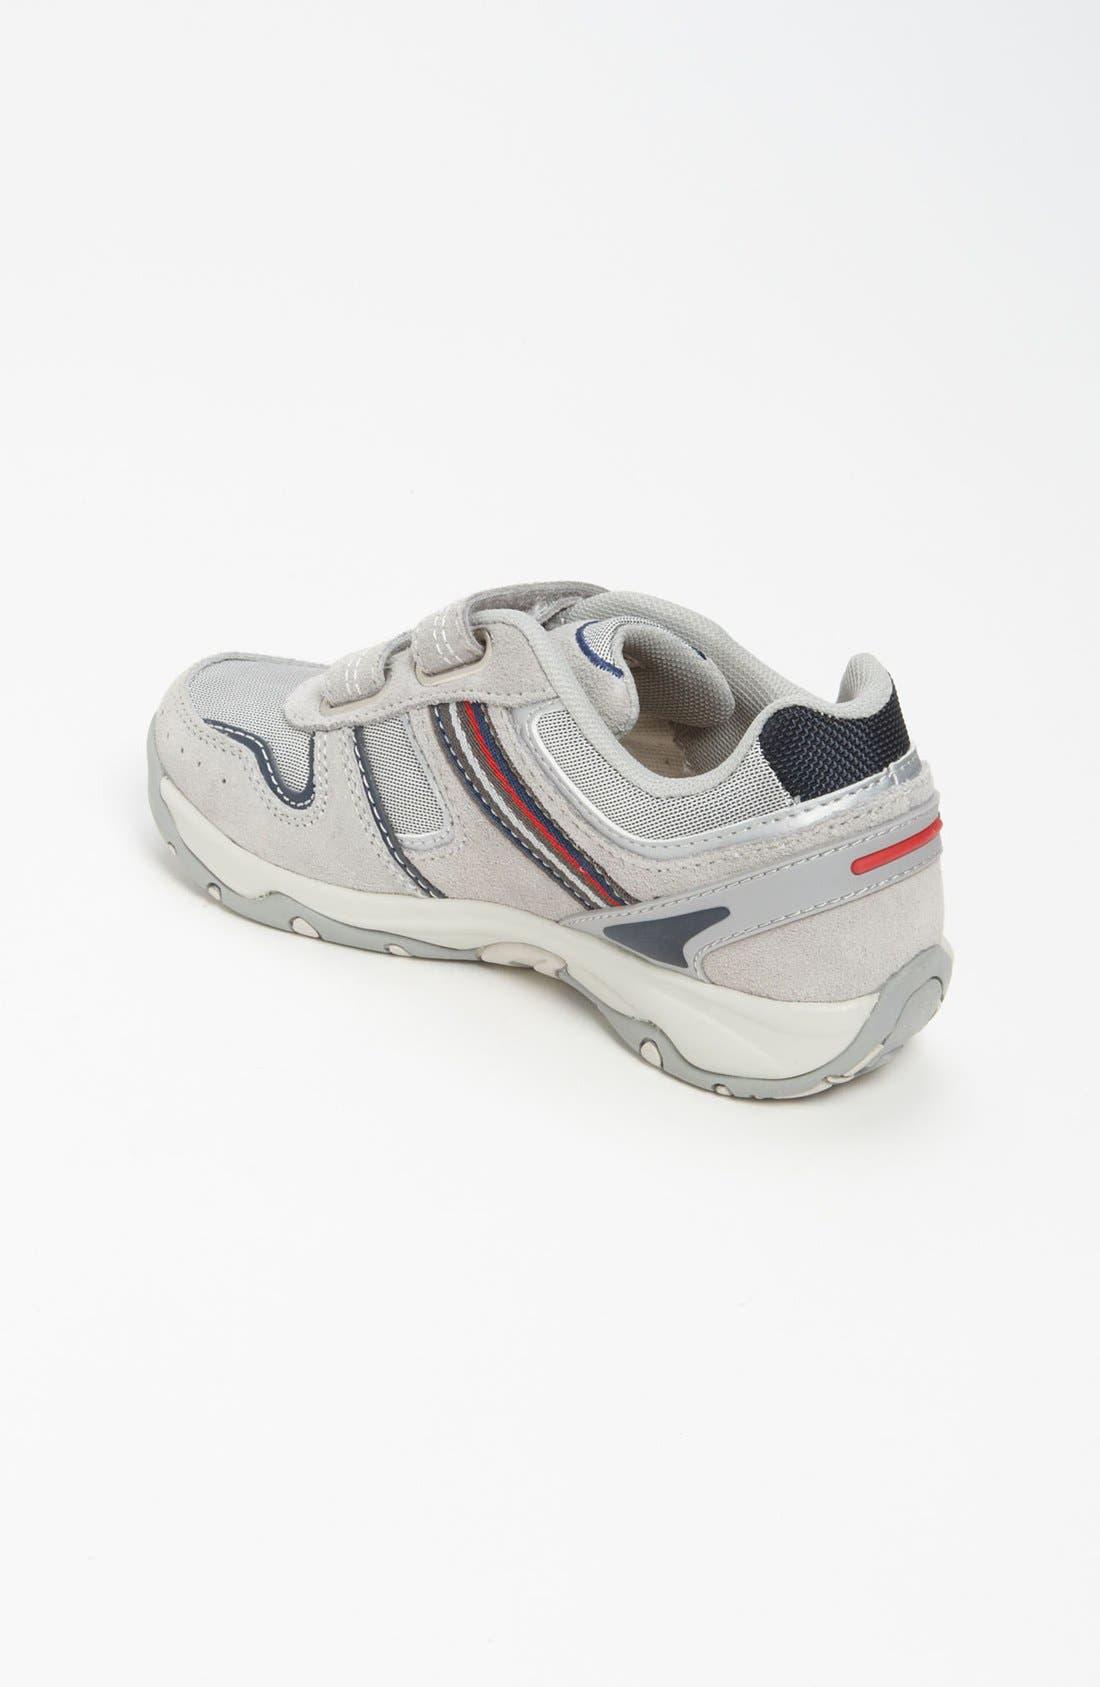 Alternate Image 2  - Swissies 'Terry' Sneaker (Toddler & Little Kid)